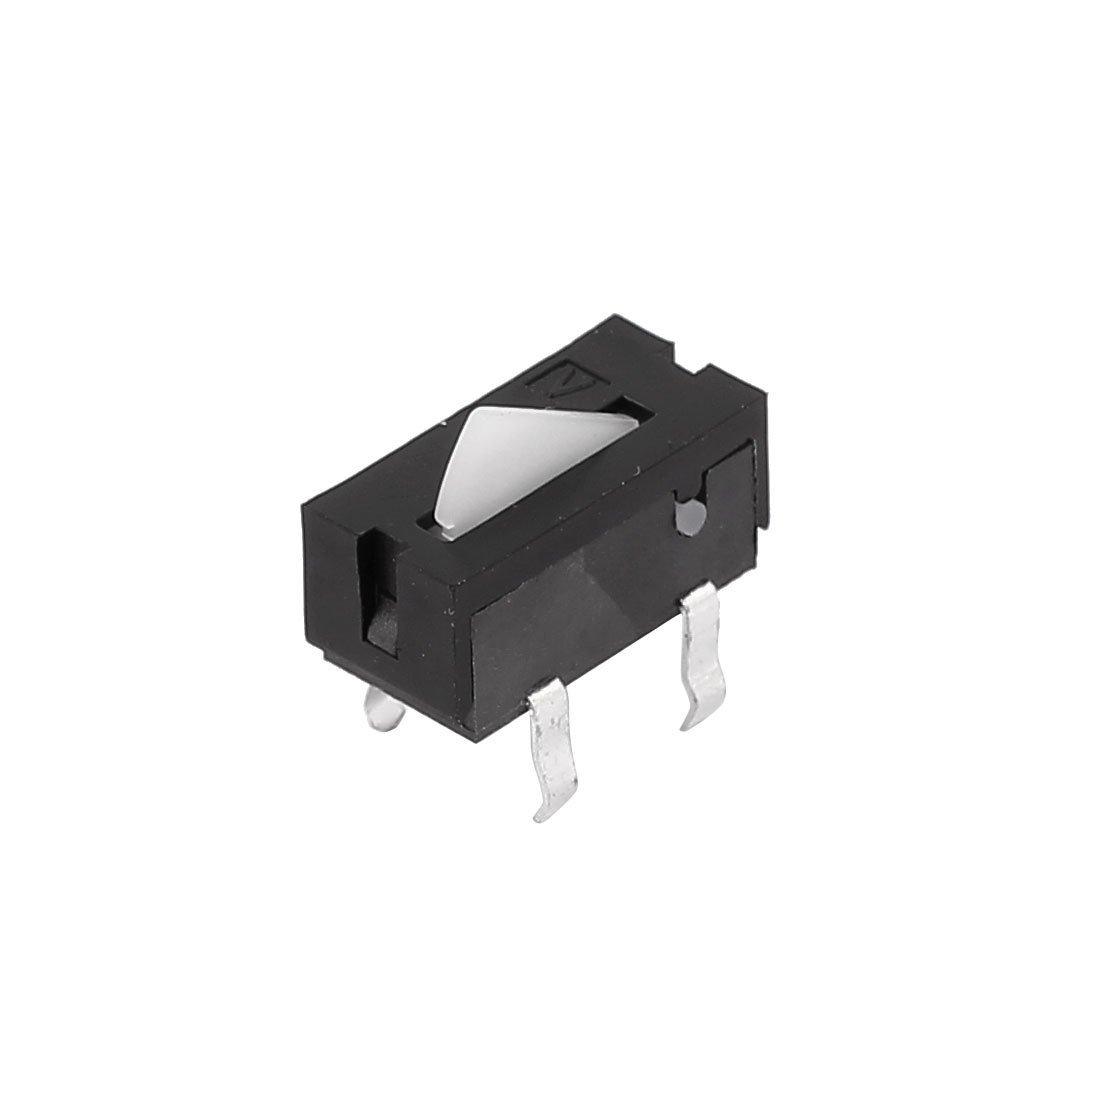 eDealMax 10pcs 4 terminales del interruptor de botón momentáneo Mini interruptor del tacto de empuje Para la cámara: Amazon.com: Industrial & Scientific